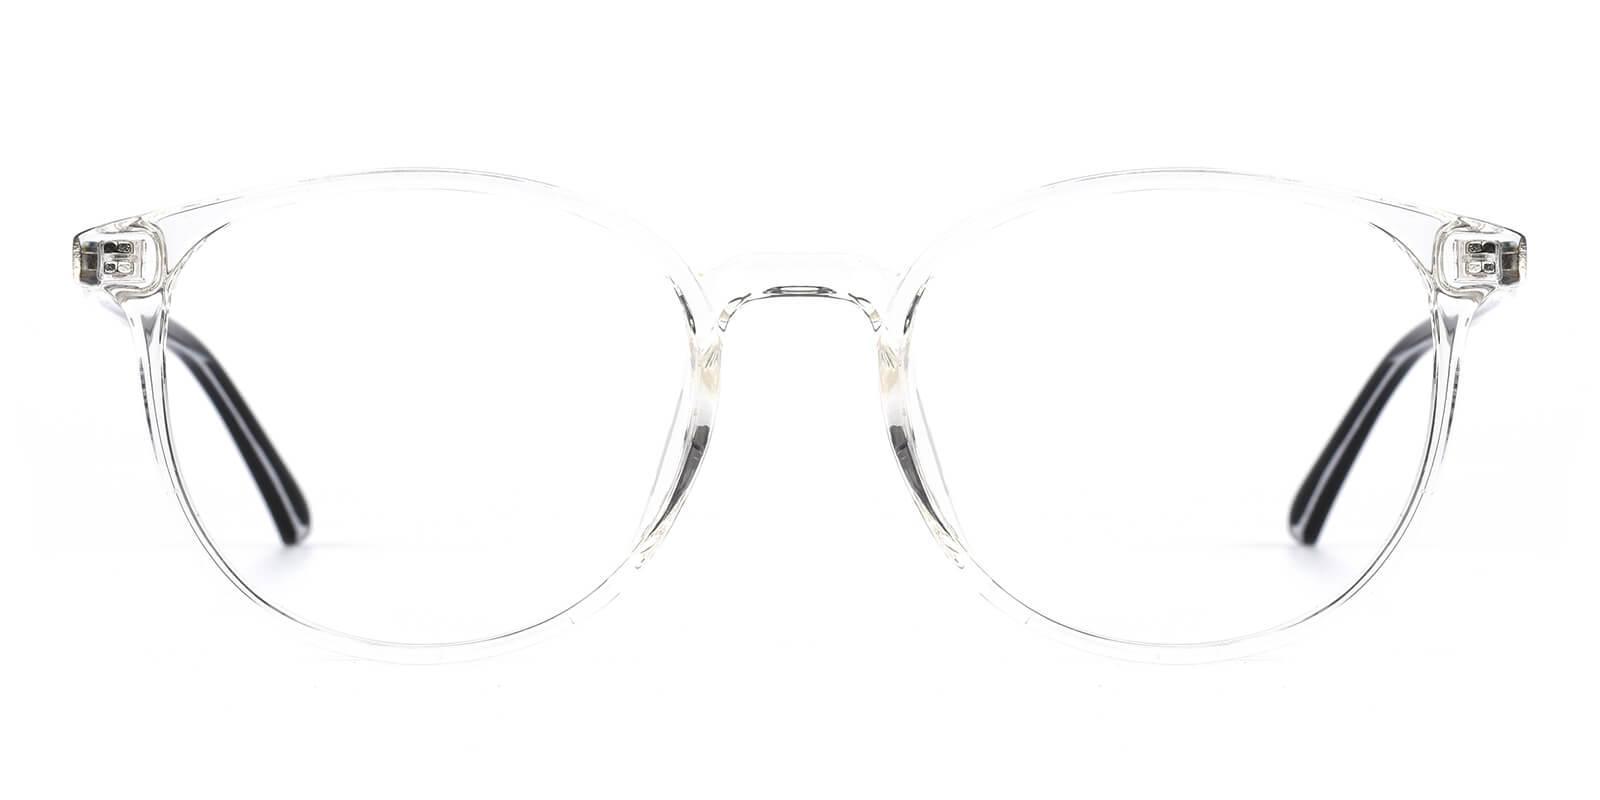 Aure-Translucent-Round-TR-Eyeglasses-additional2